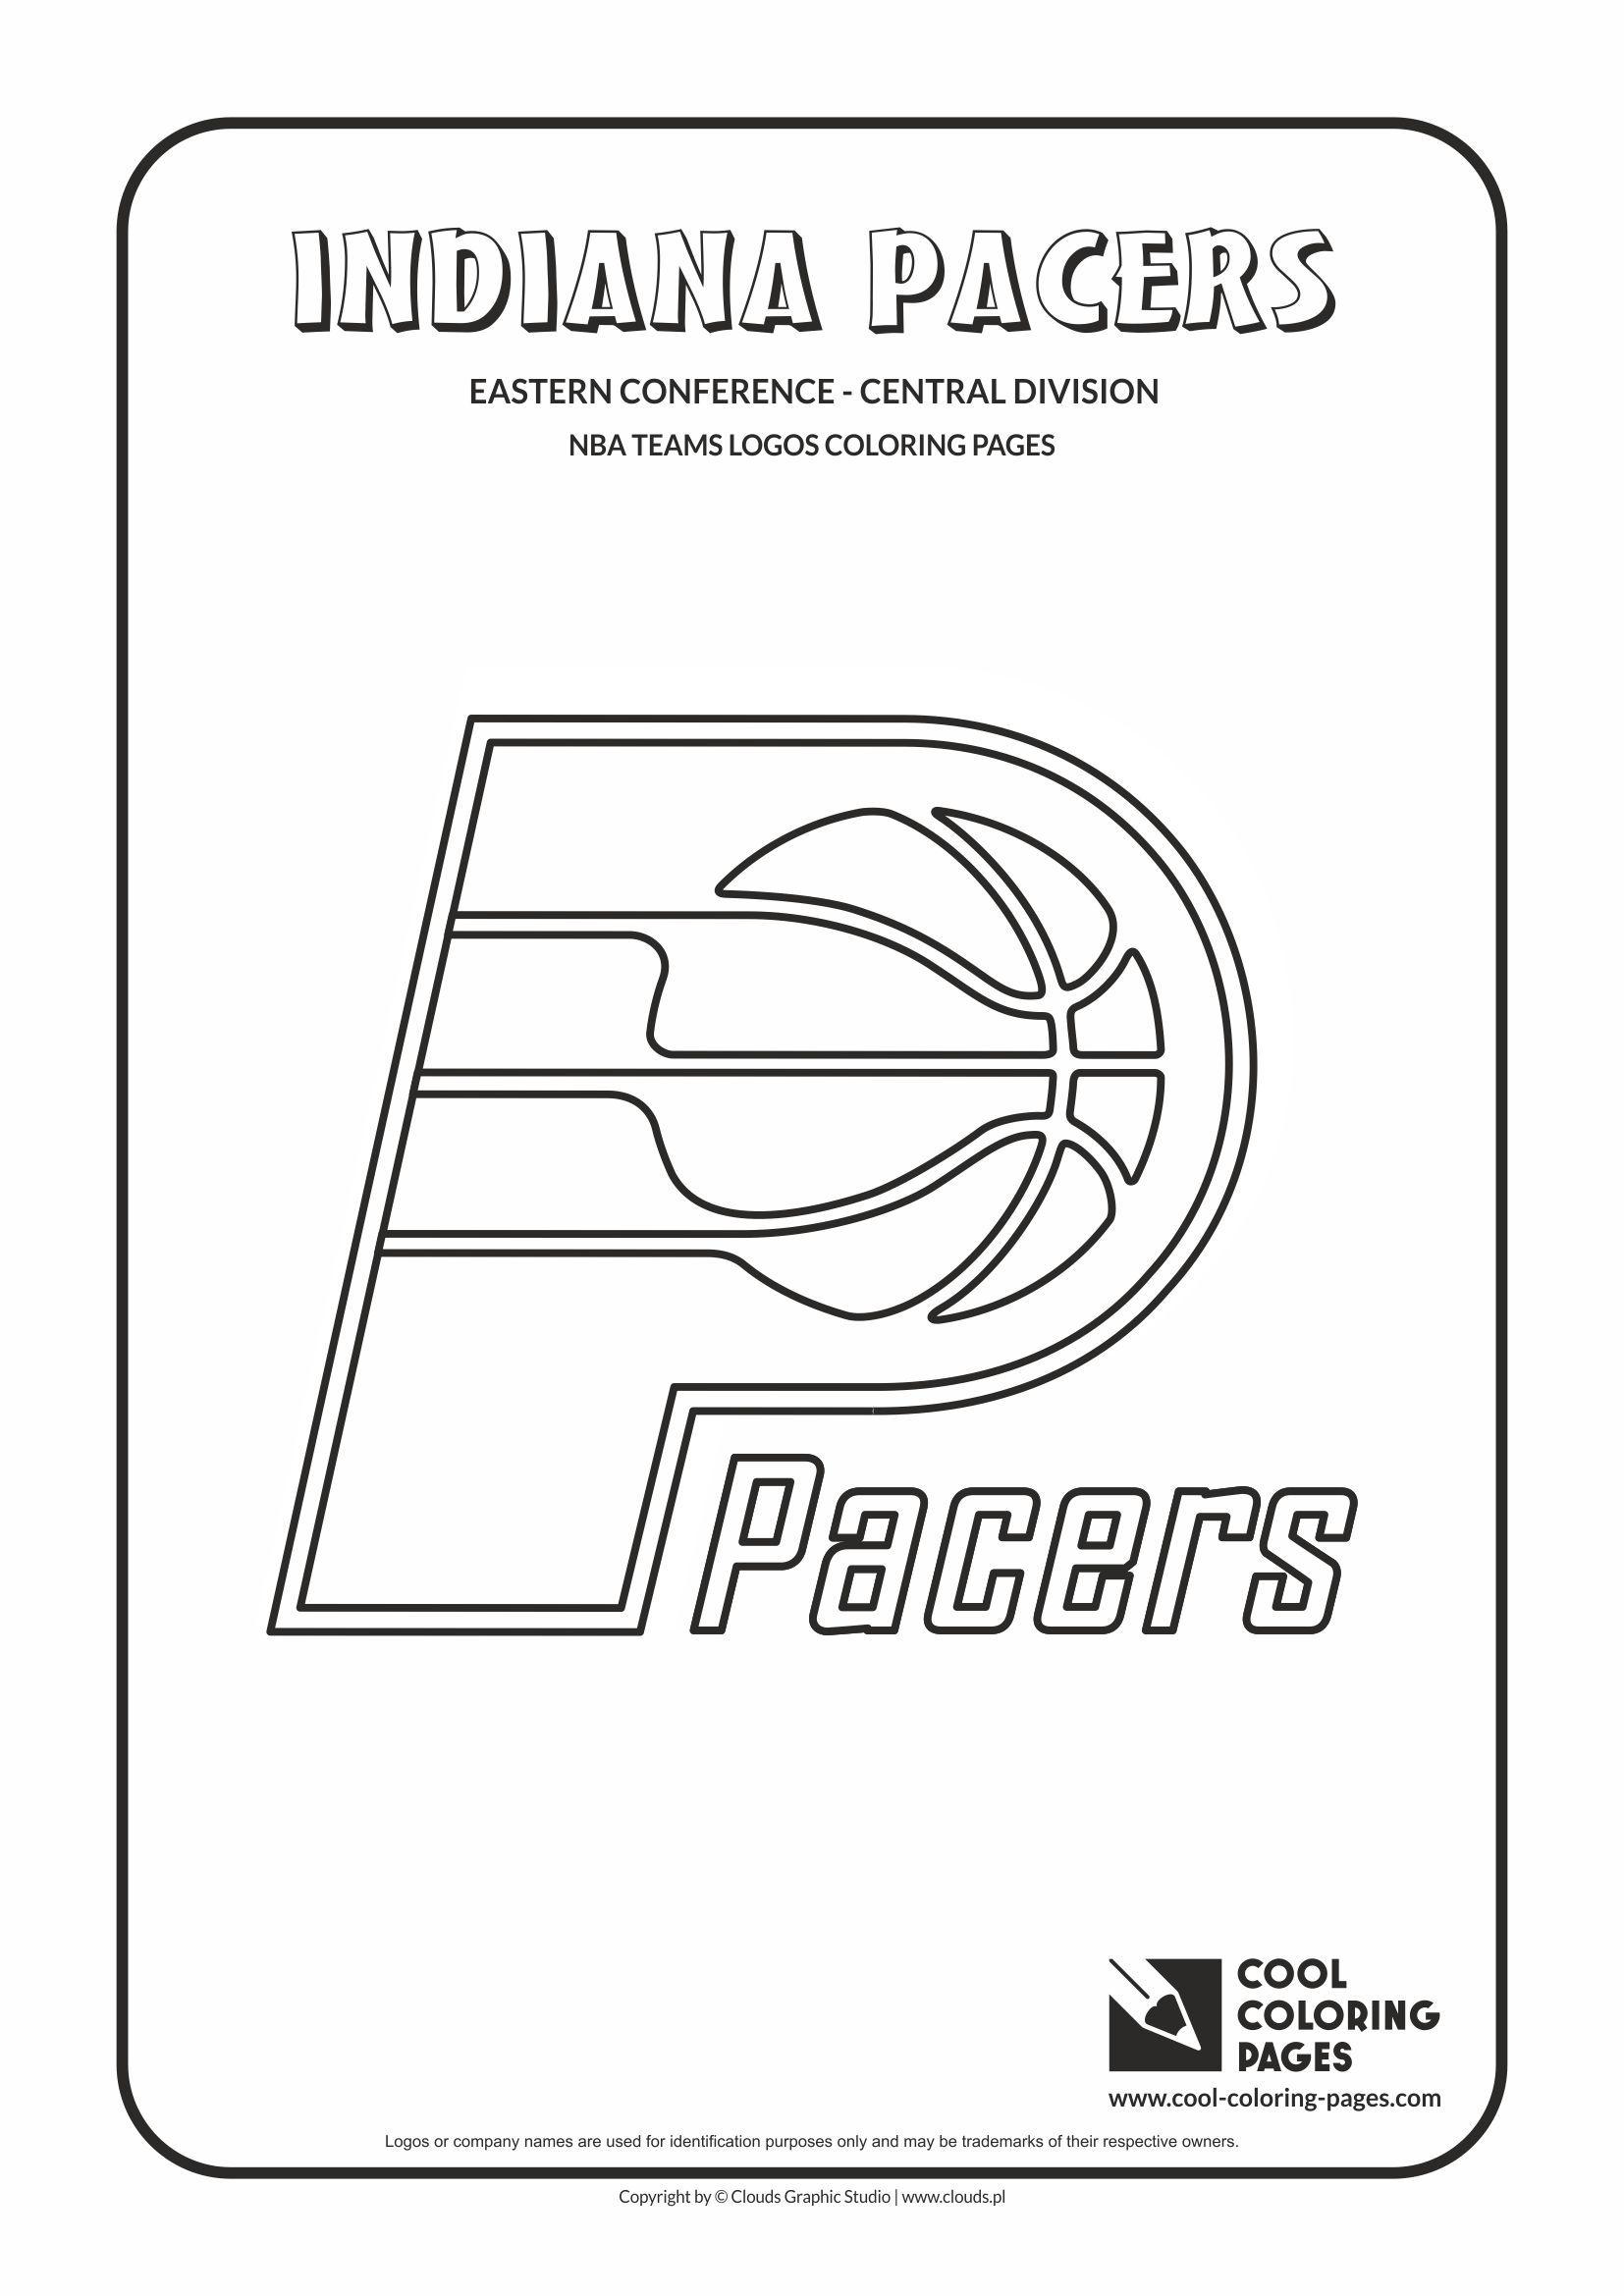 Cool Coloring Pages Nba Teams Logos Indiana Pacers Logo Coloring Page With Flag Coloring Pages Cool Coloring Pages Coloring Pages Inspirational